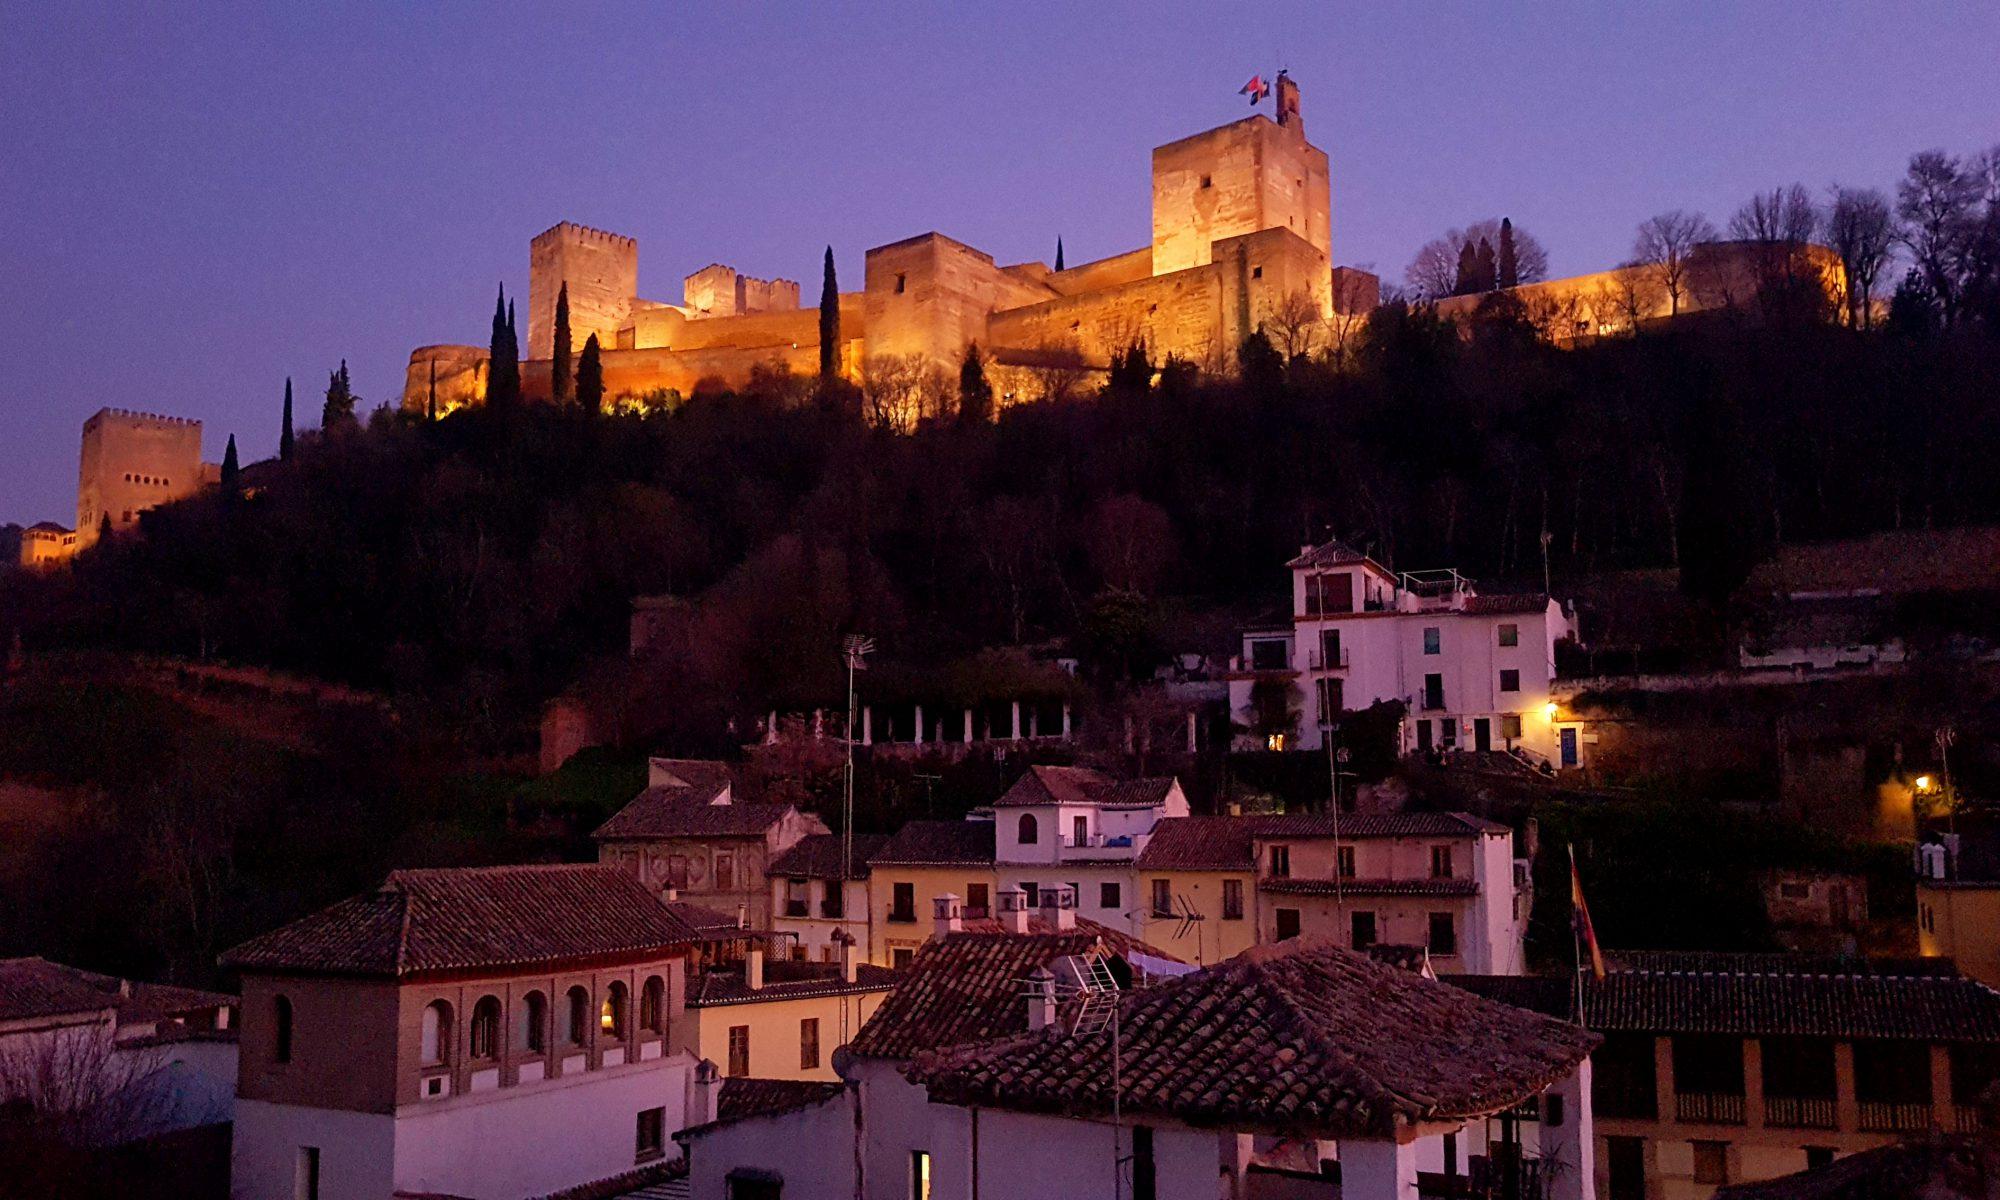 Granada with Alhambra